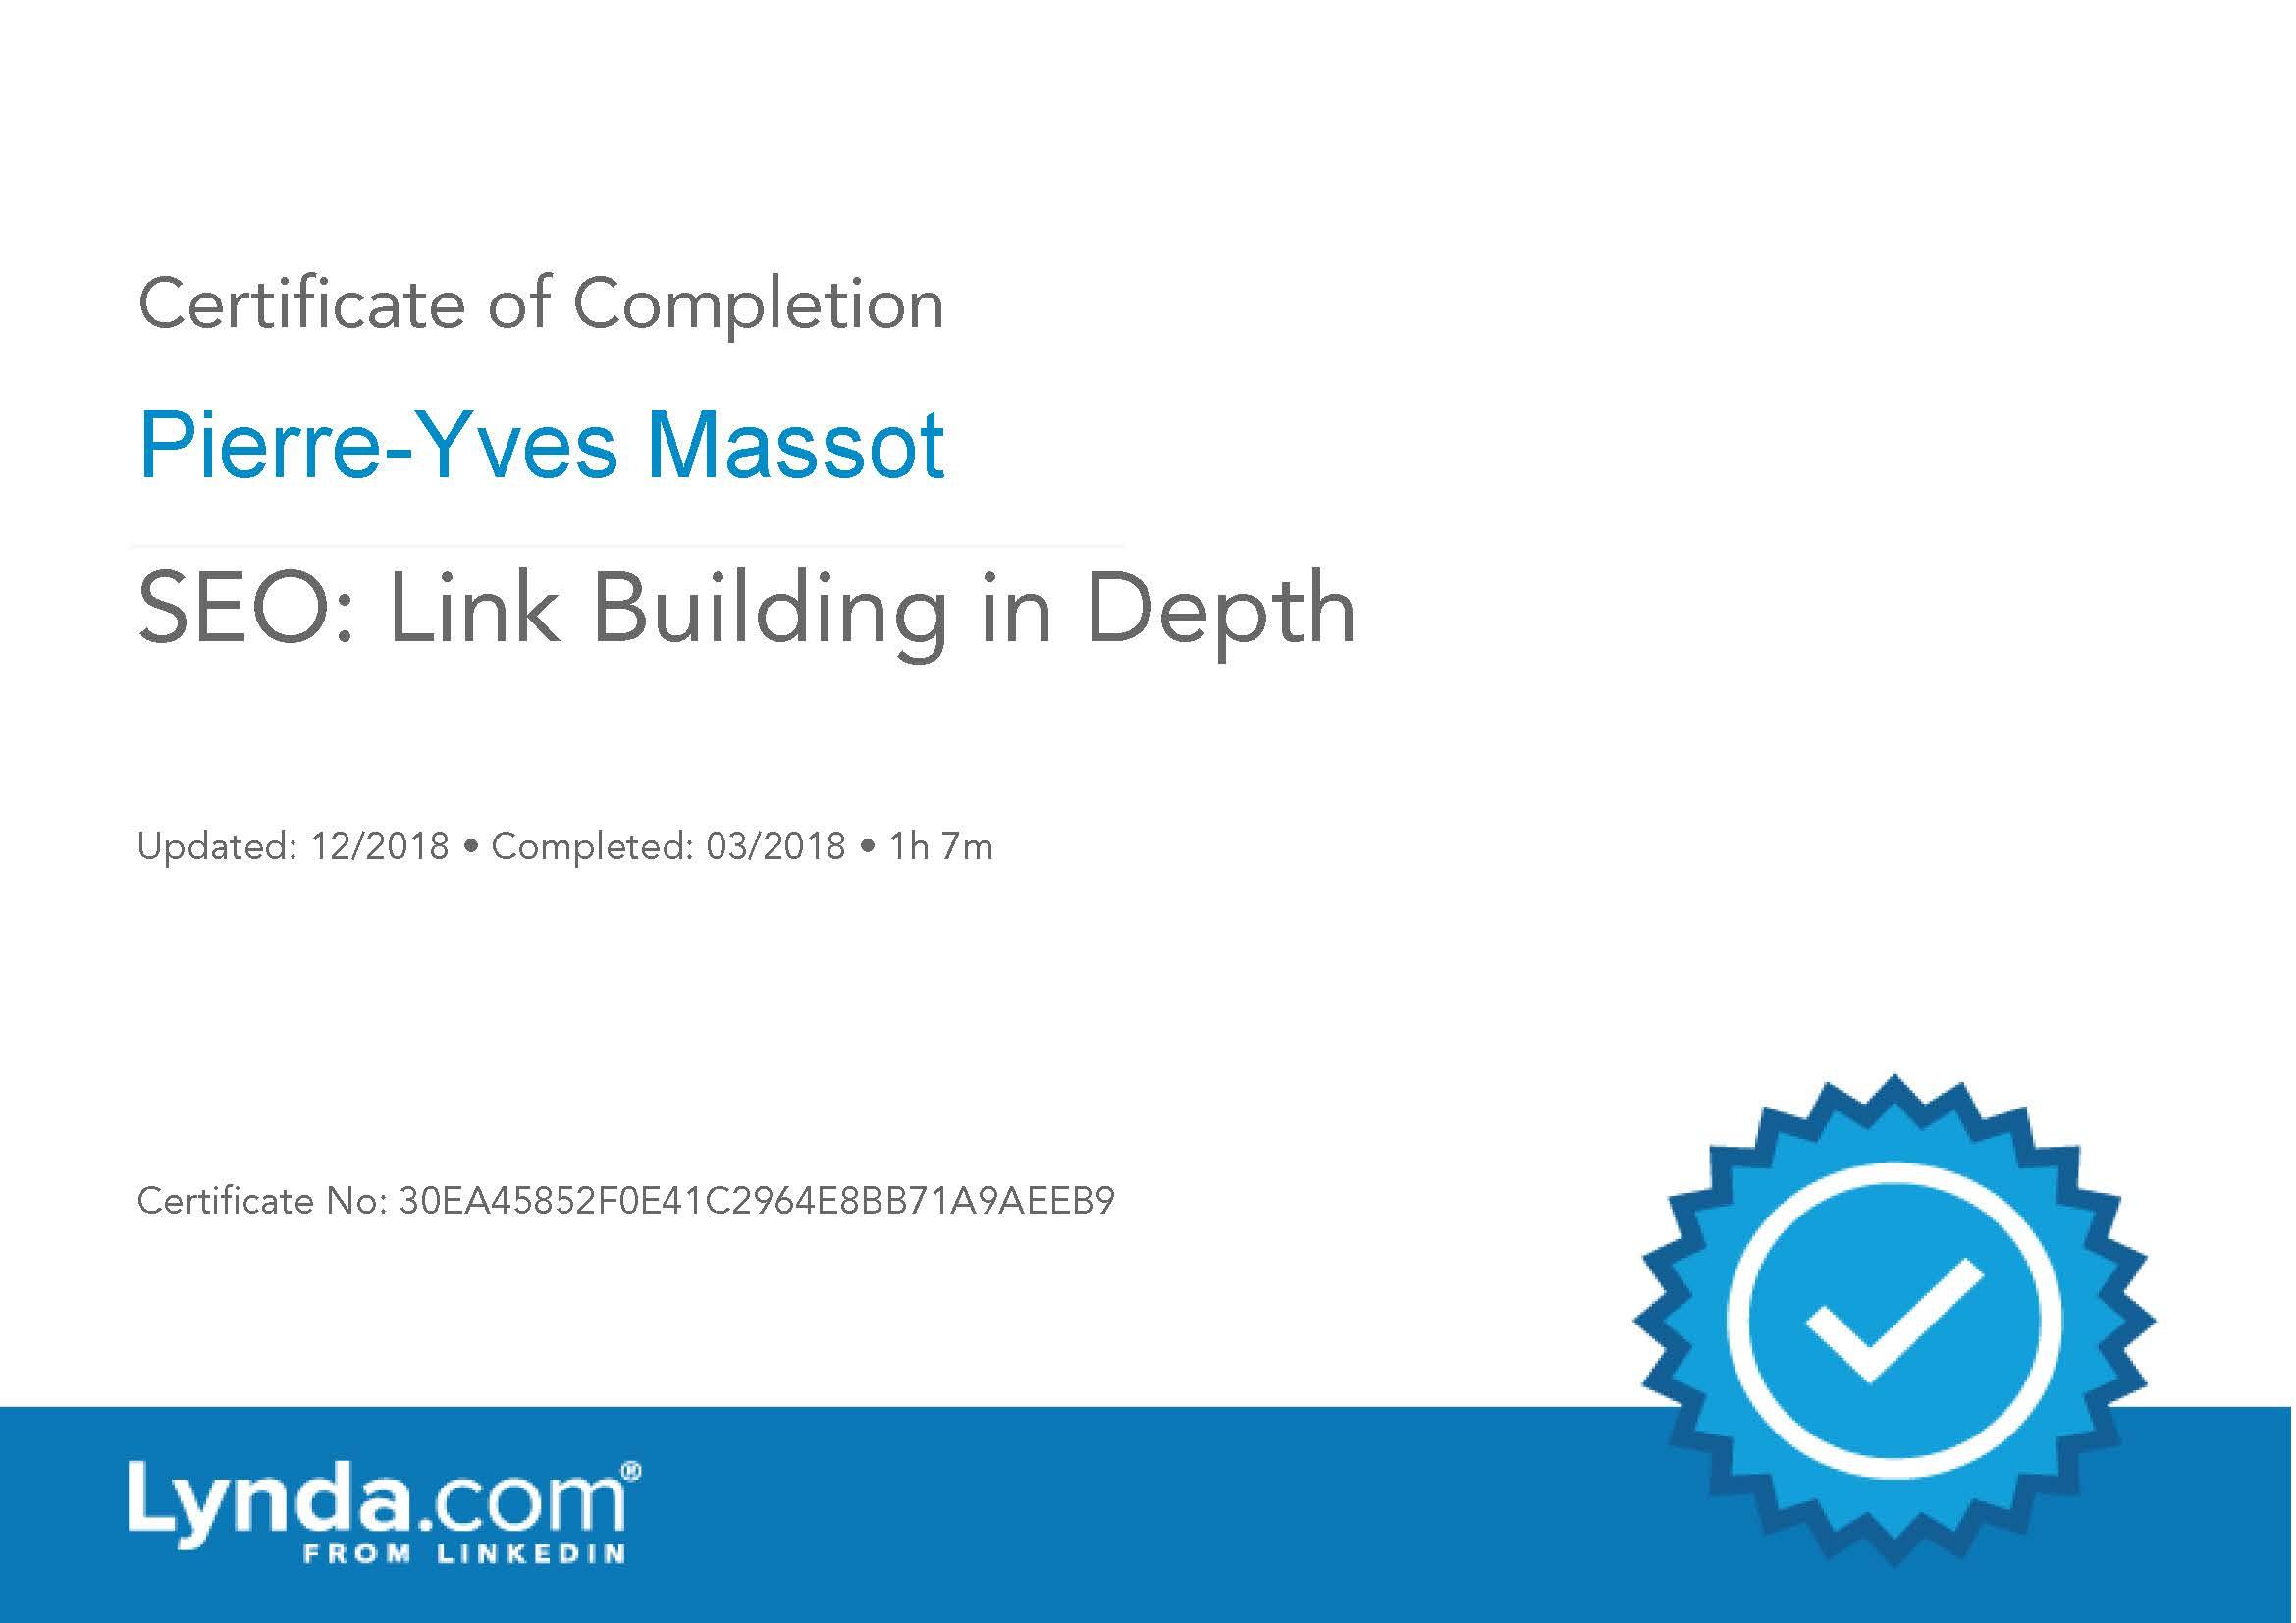 SEO_LinkBuildinginDepth_CertificateOfCompletion.jpg